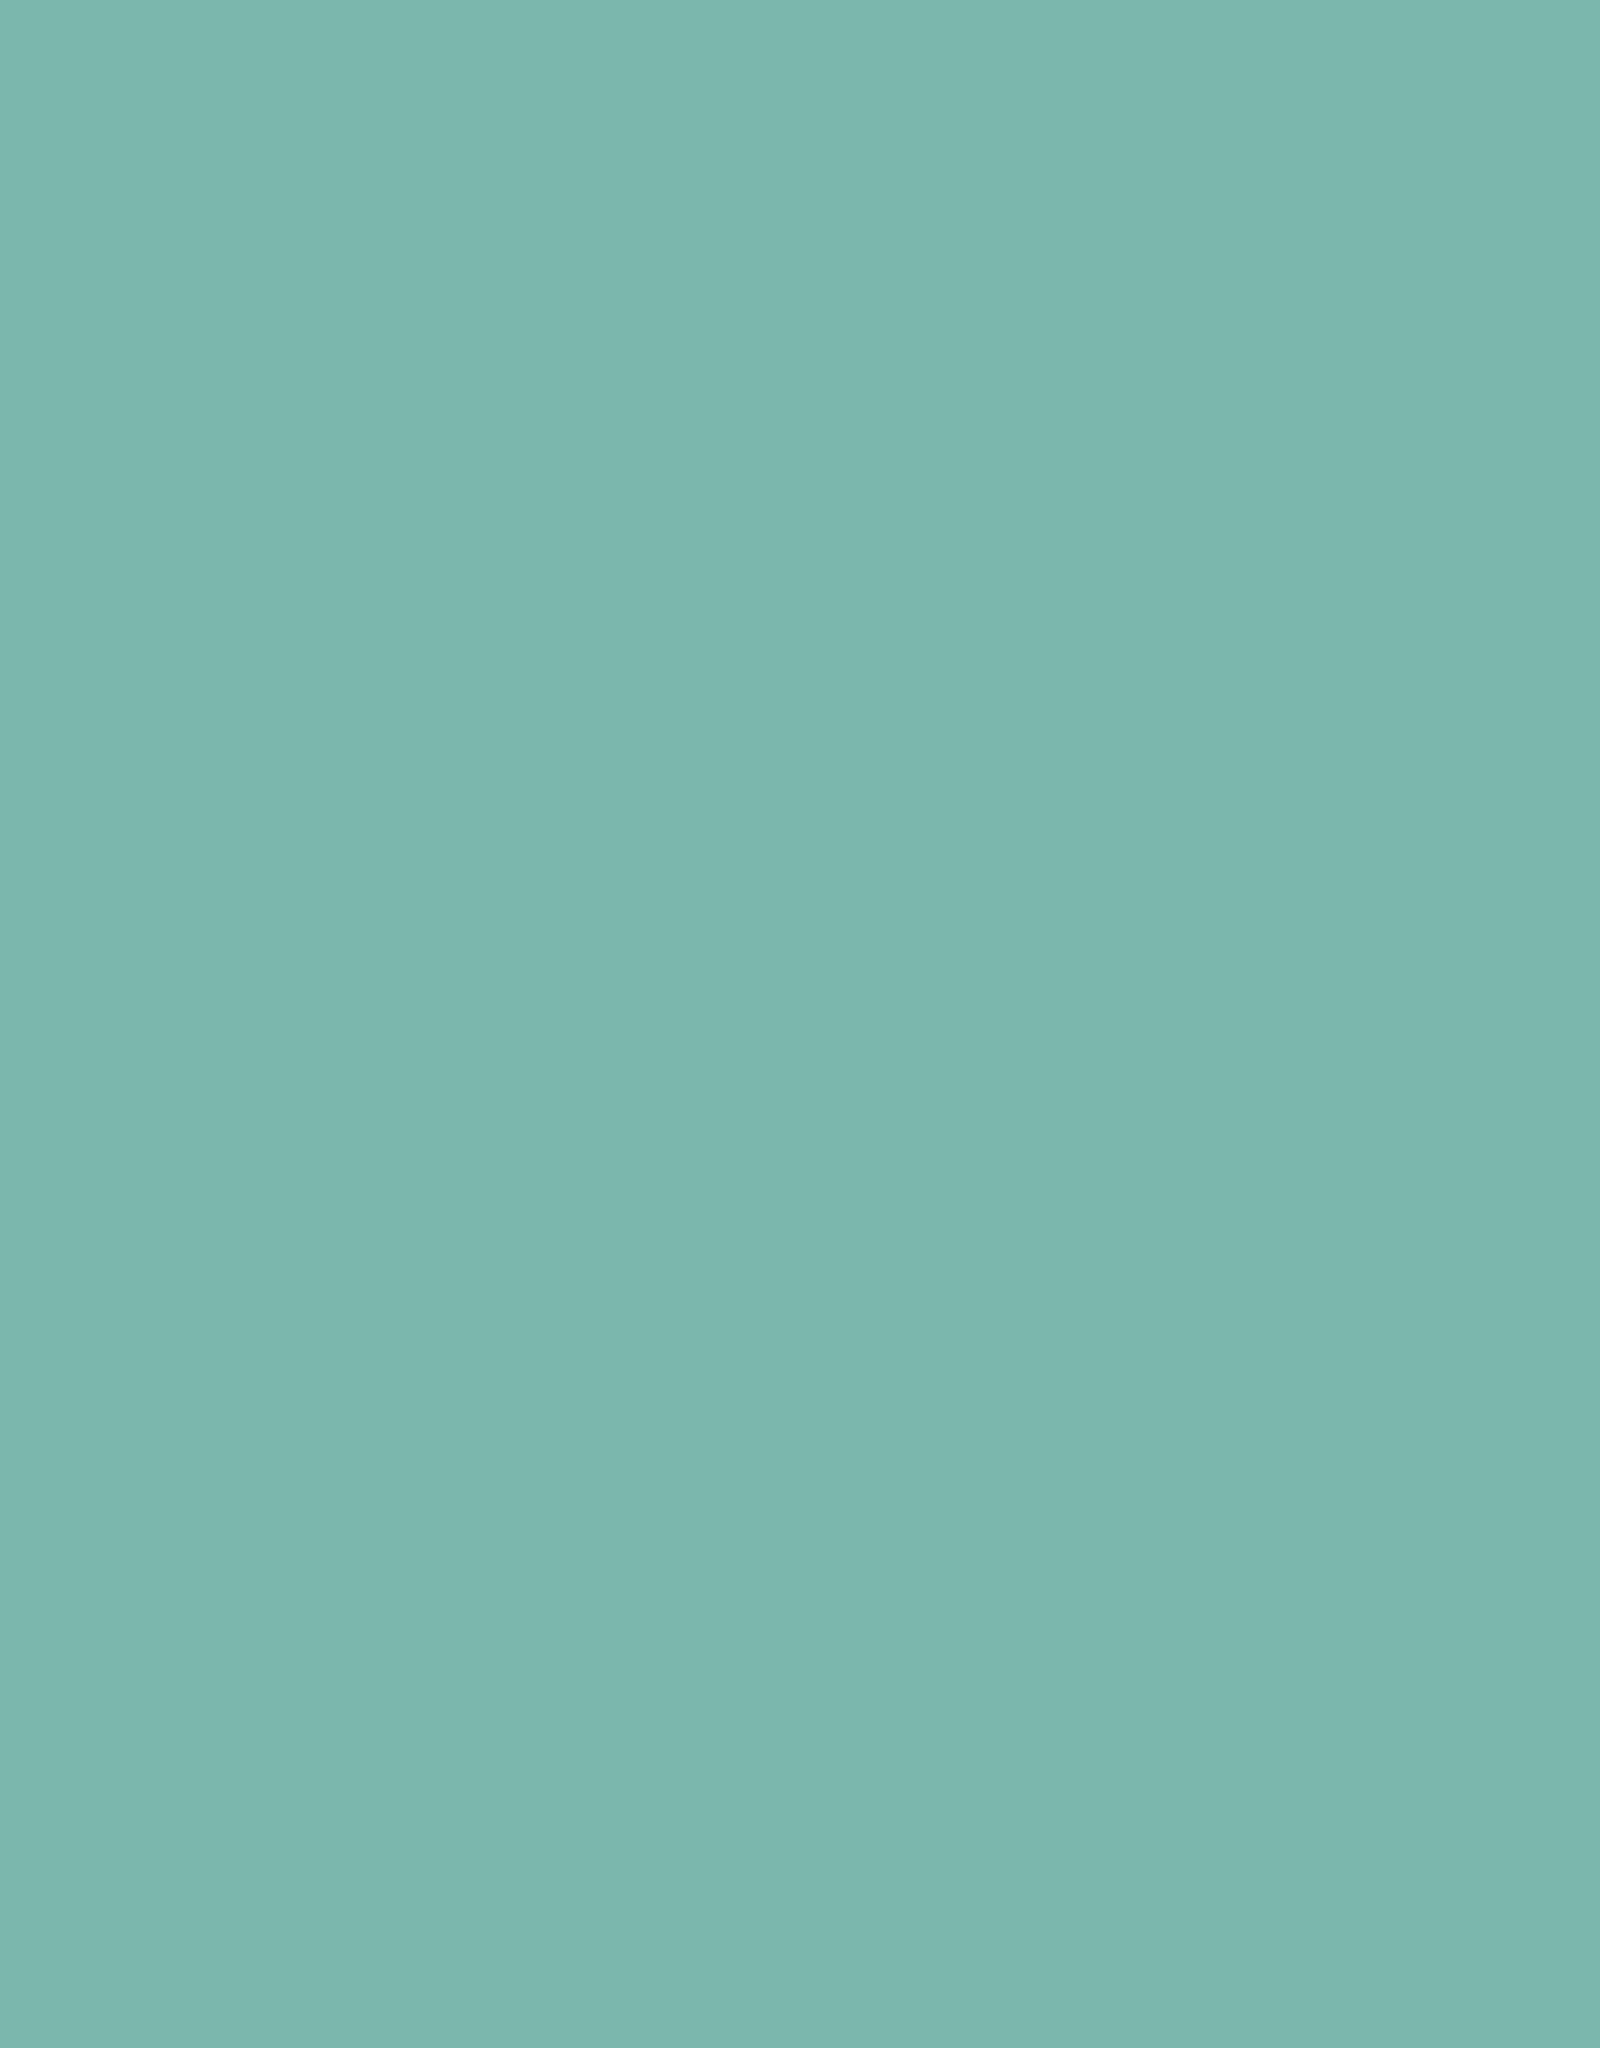 Sennelier, Extra Fine Soft Pastel, Jade Green, N 956